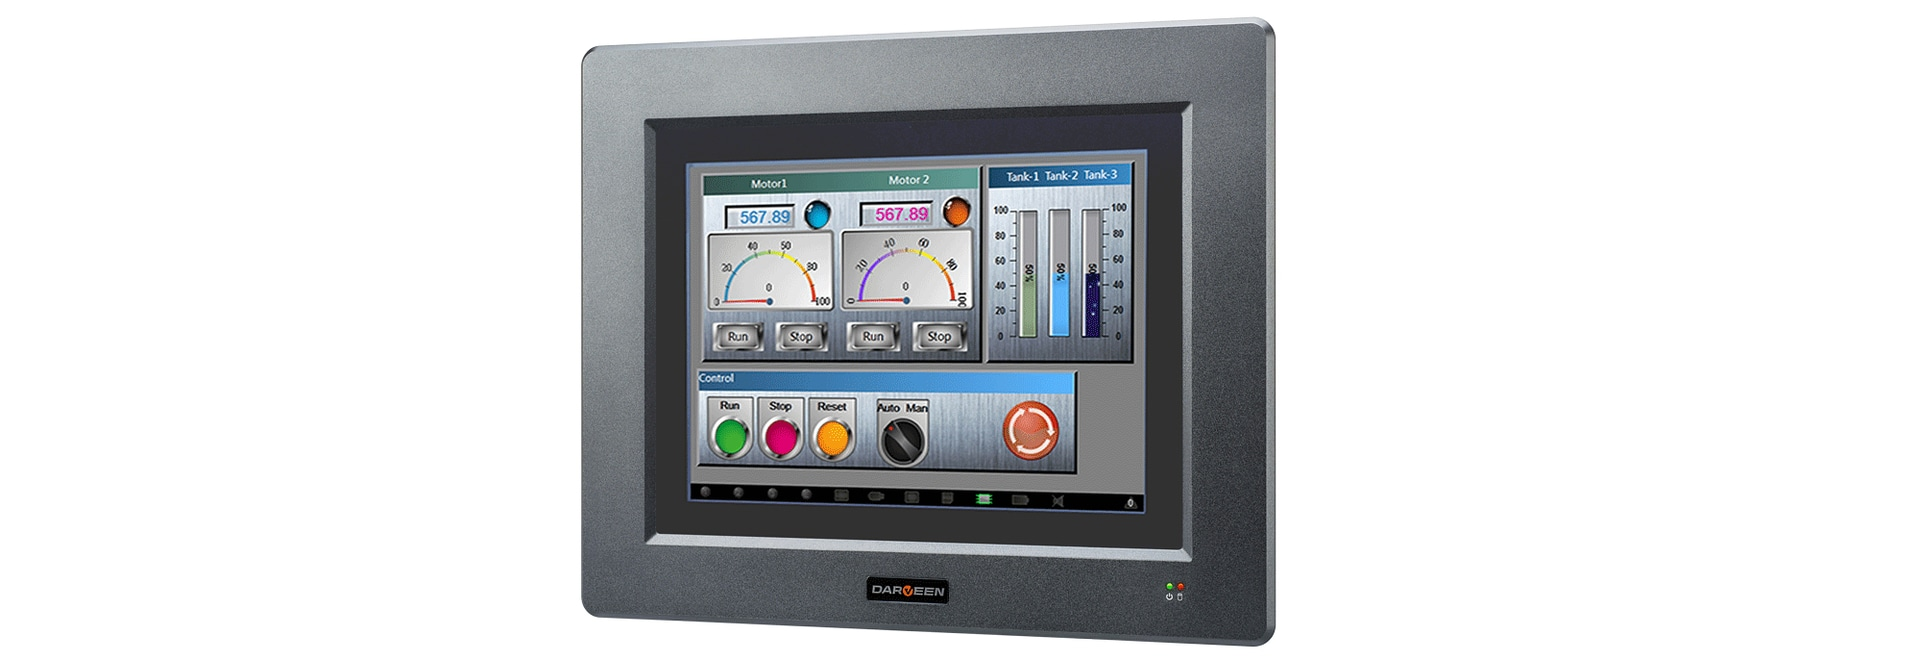 Darveen launched a new industrial-grade HMI computer DPC-3000 Series